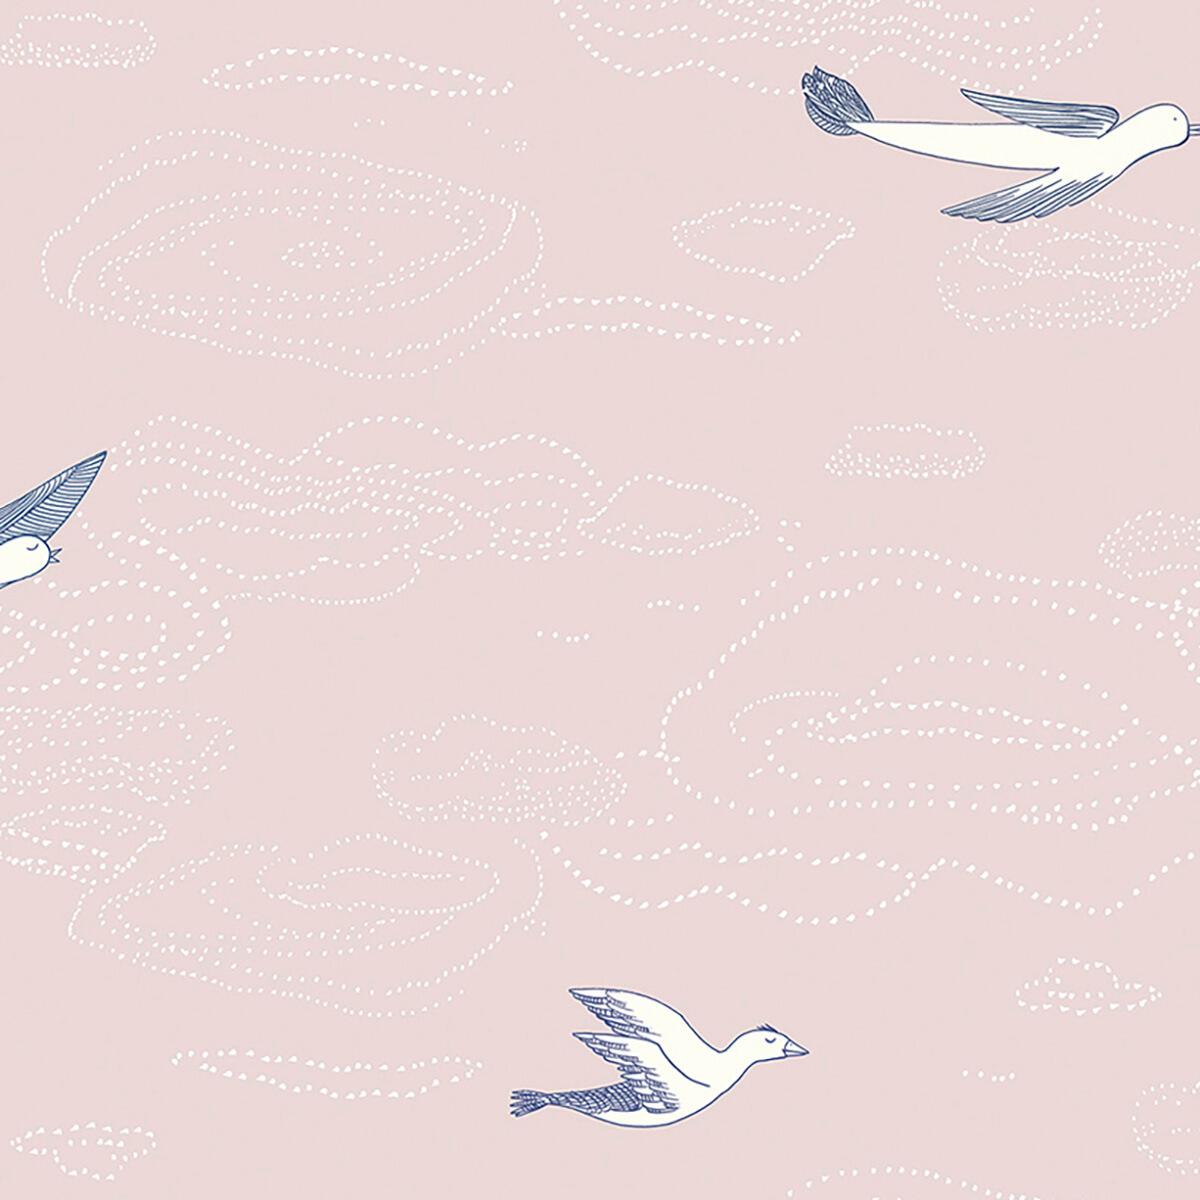 Papel de parede voo | Sandra Jávera